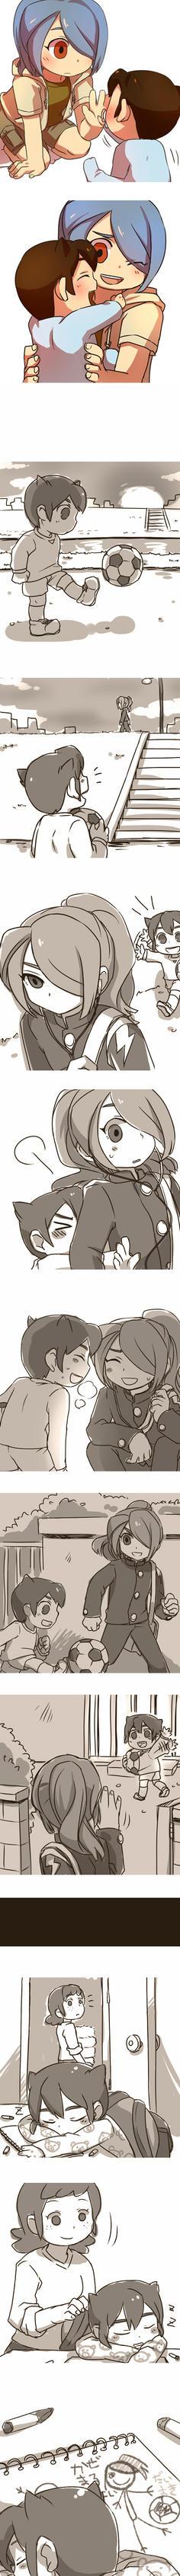 Ina11:Kazemaru and chibi Endo by sagenac